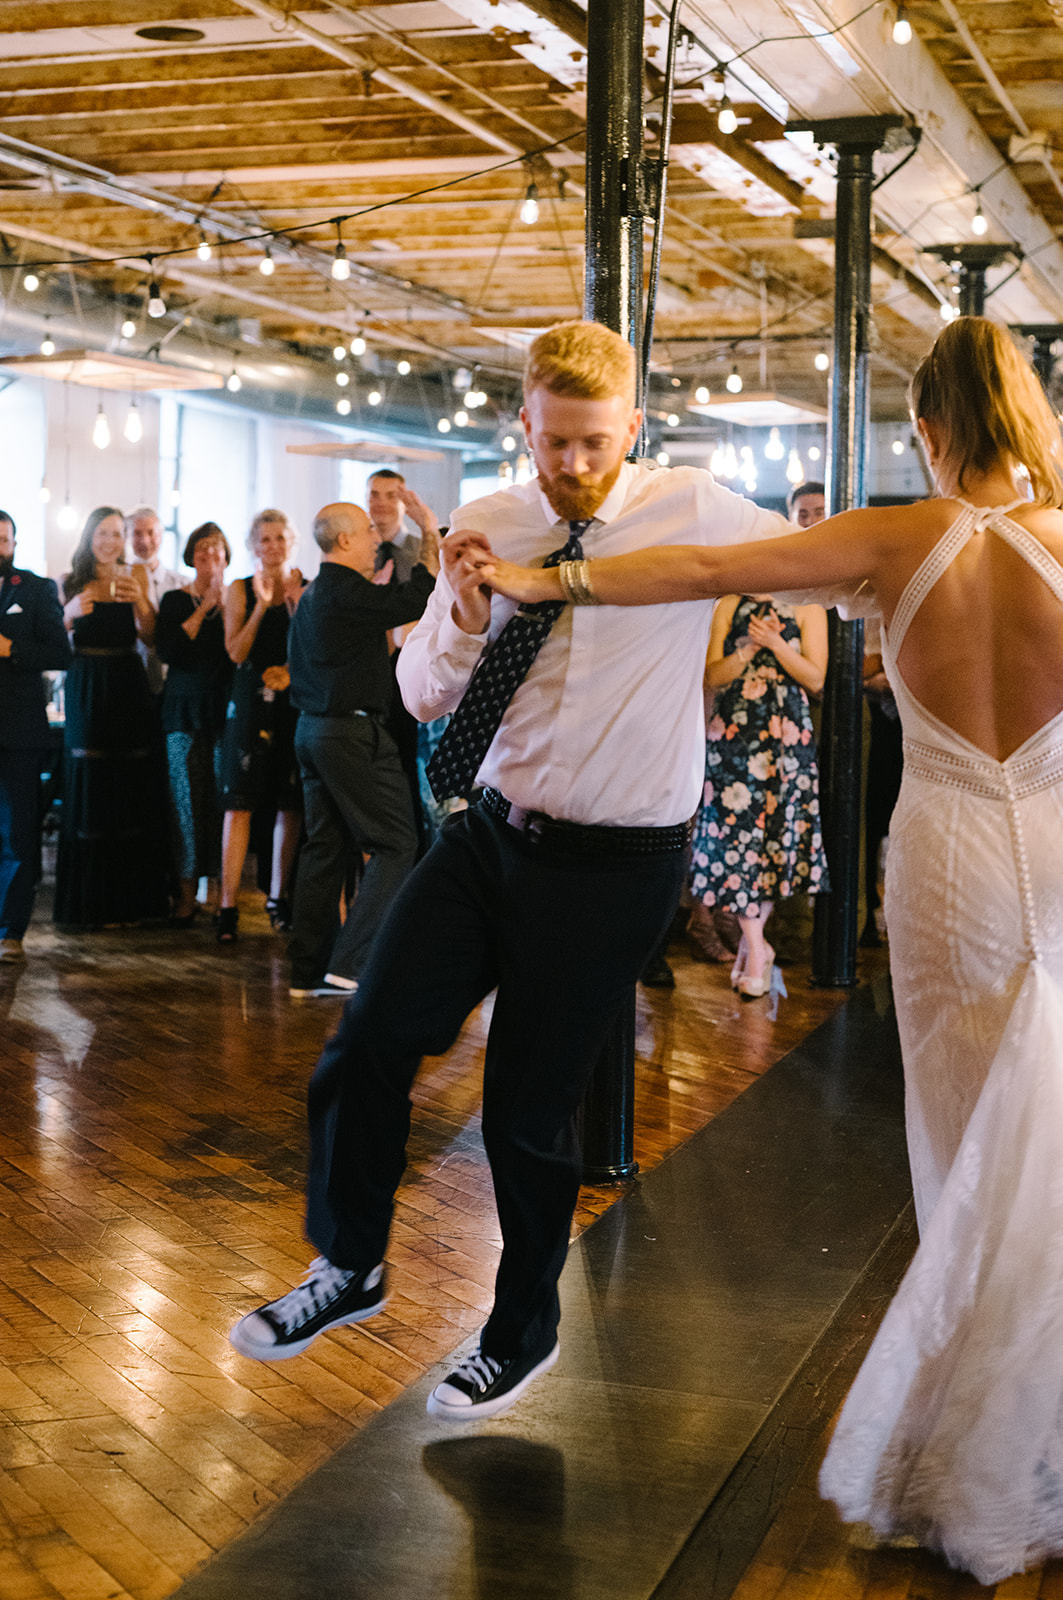 Art Factory Wedding- Industrial Chic- Audrey+Ryan- Paterson NJ- Olivia Christina Photo (58).jpg